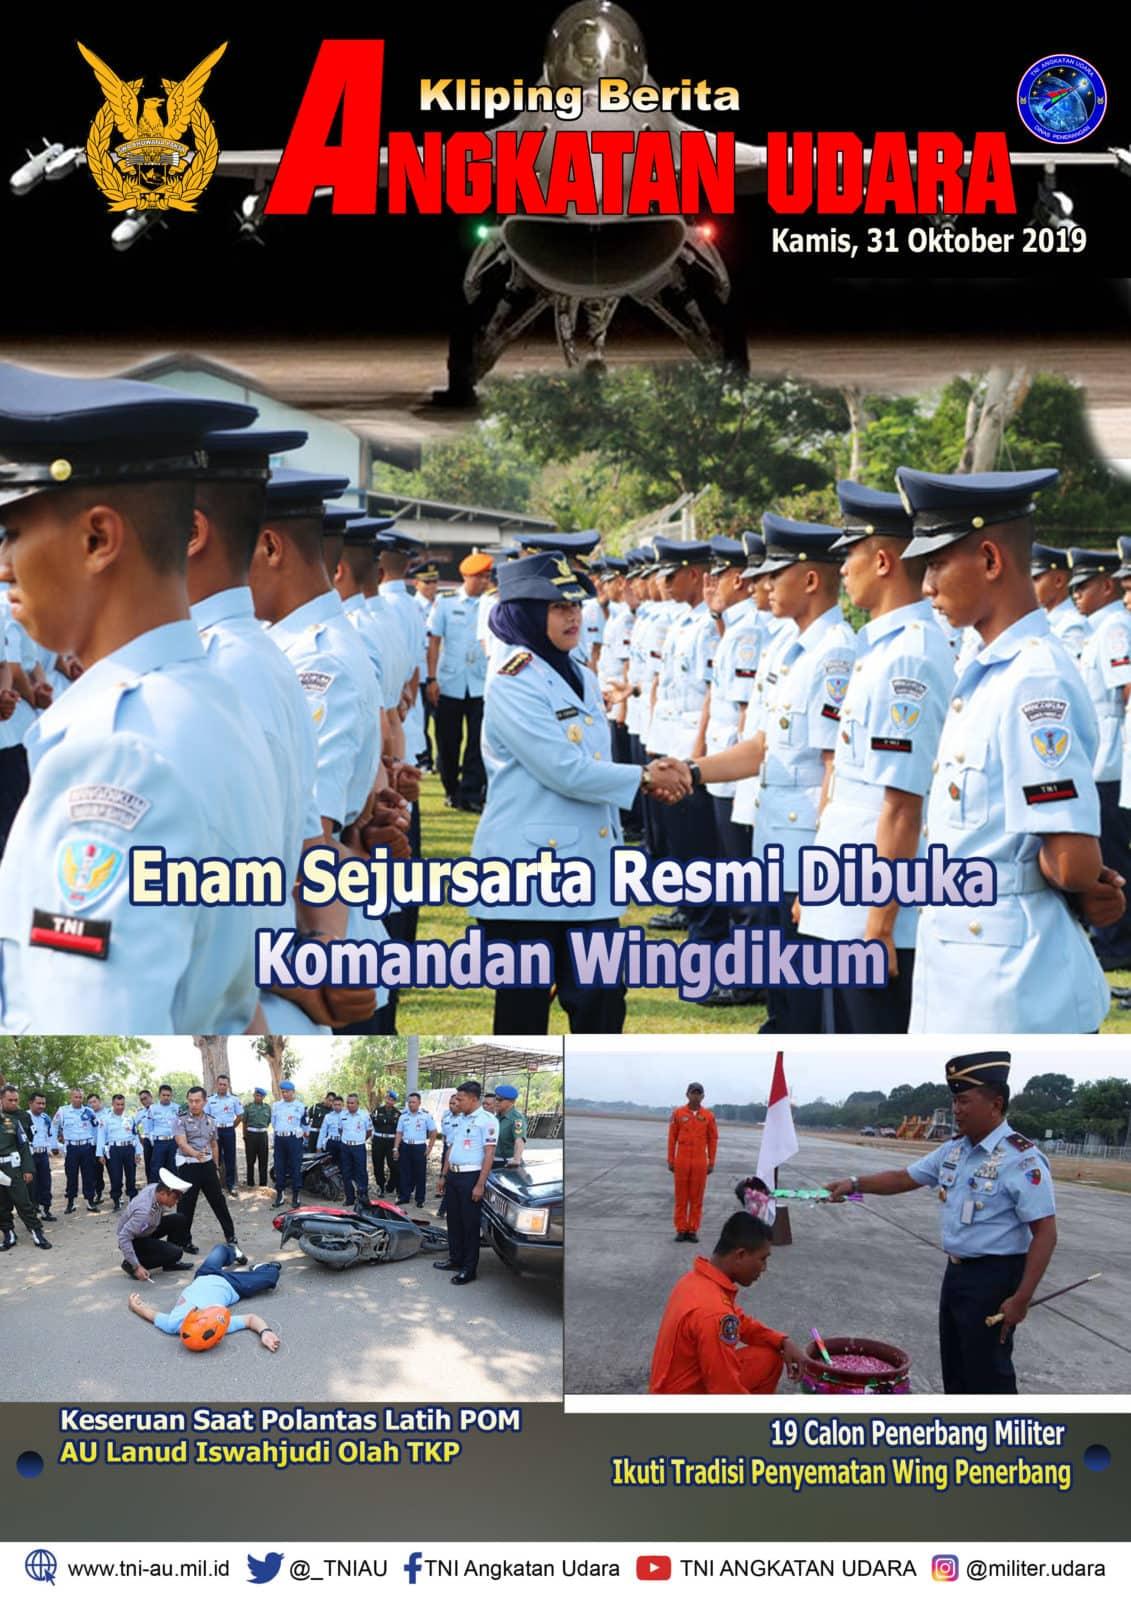 Kliping Berita Media 31 Oktober 2019